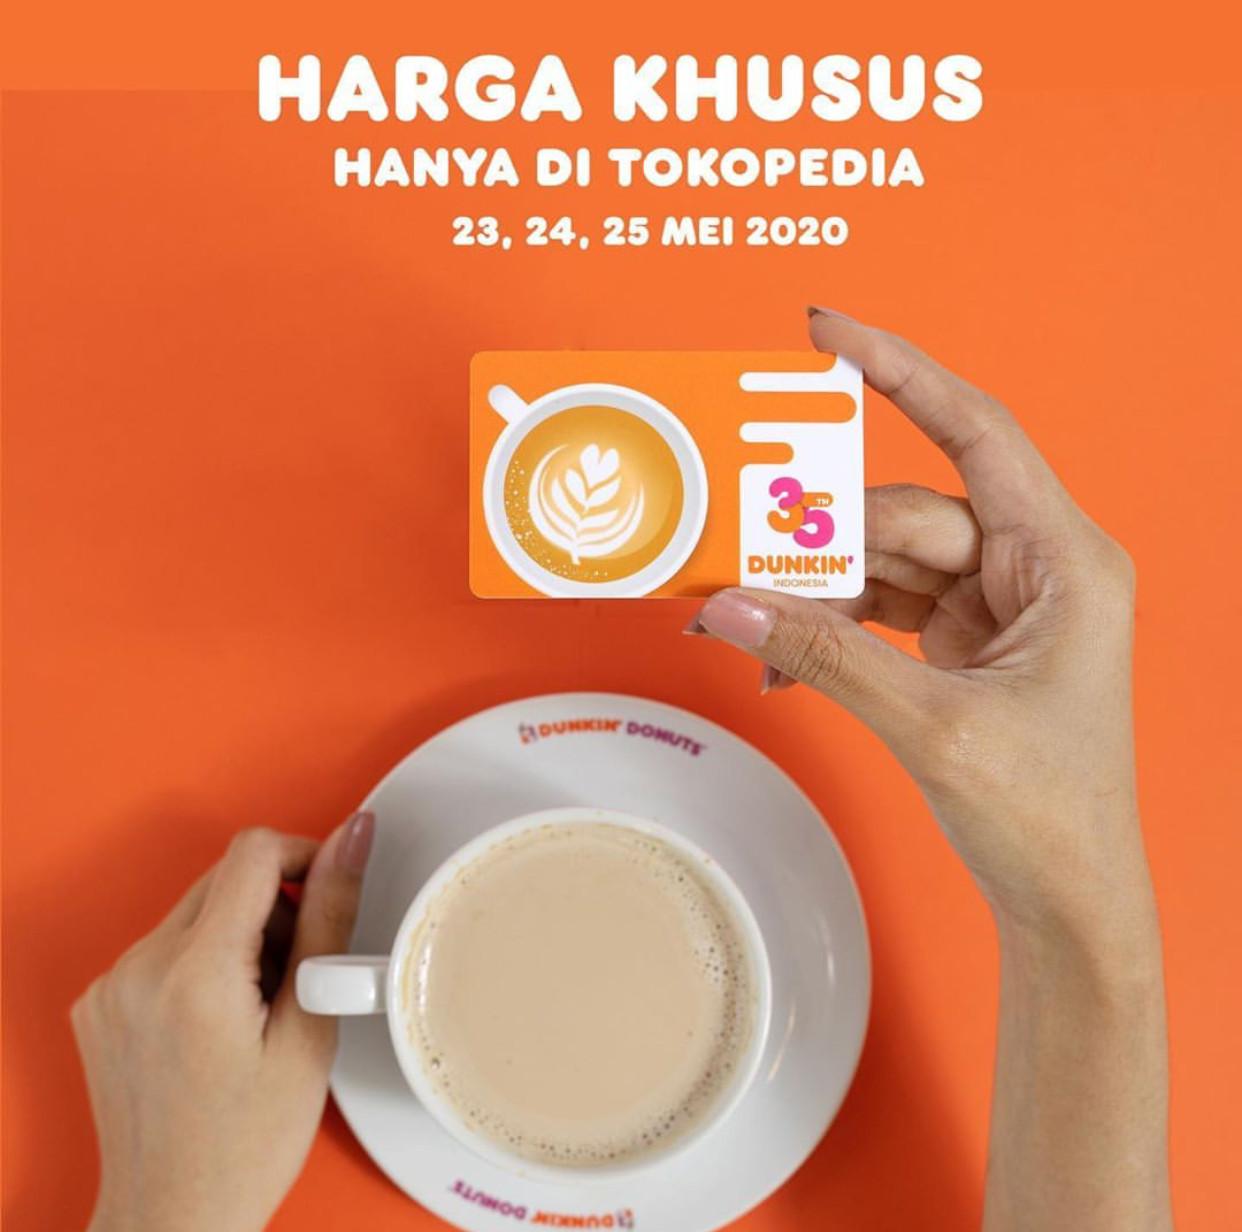 Promo Dunkin Donuts Harga Khusus DD Card di Tokopedia Hanya Rp 10.000